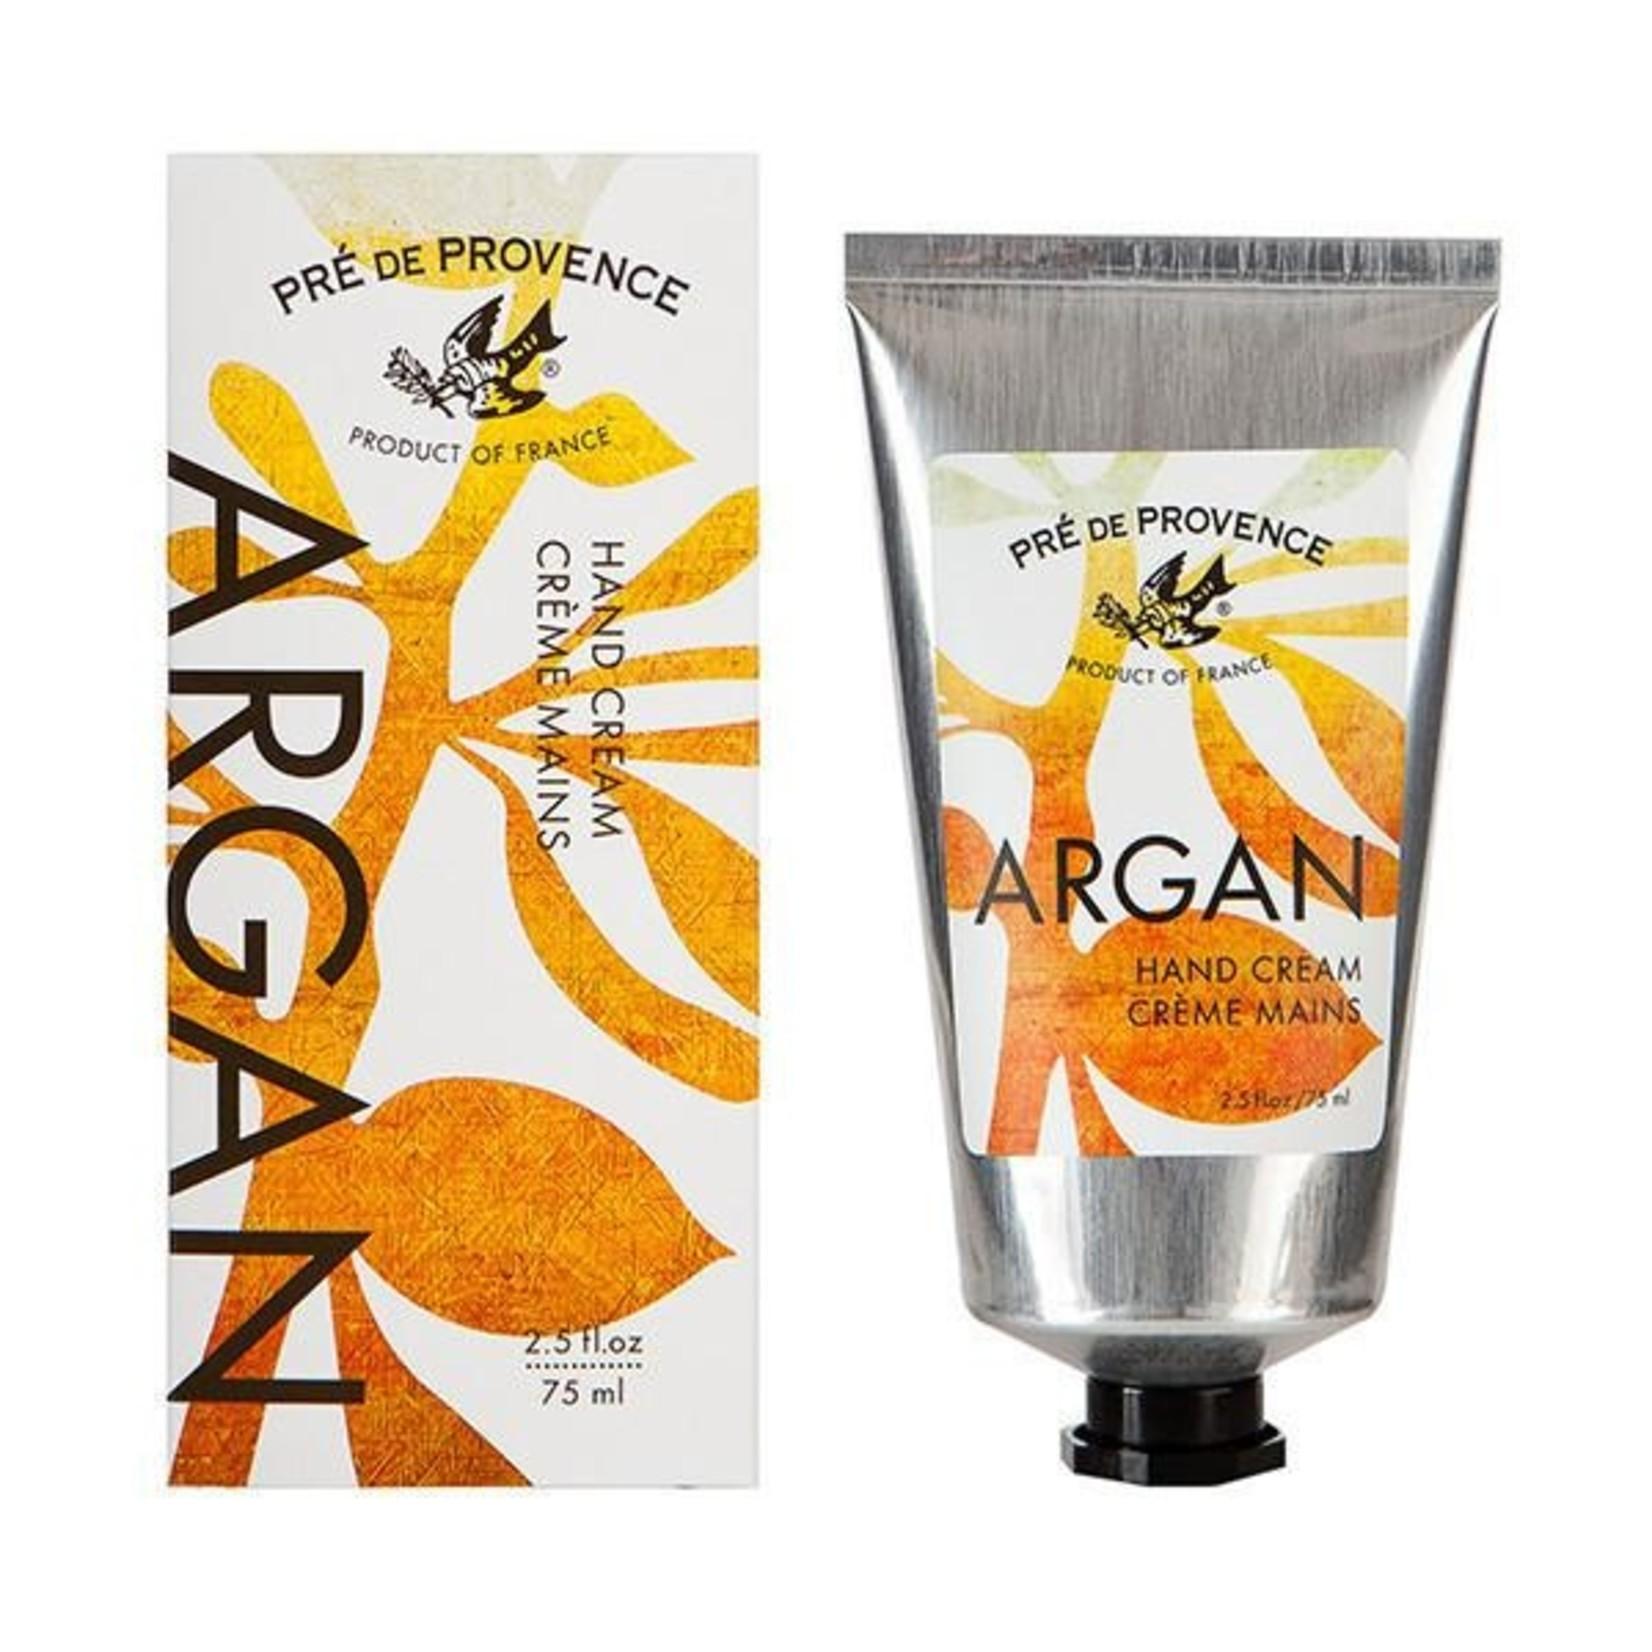 Pre de Provence Argan Oil Hand Cream